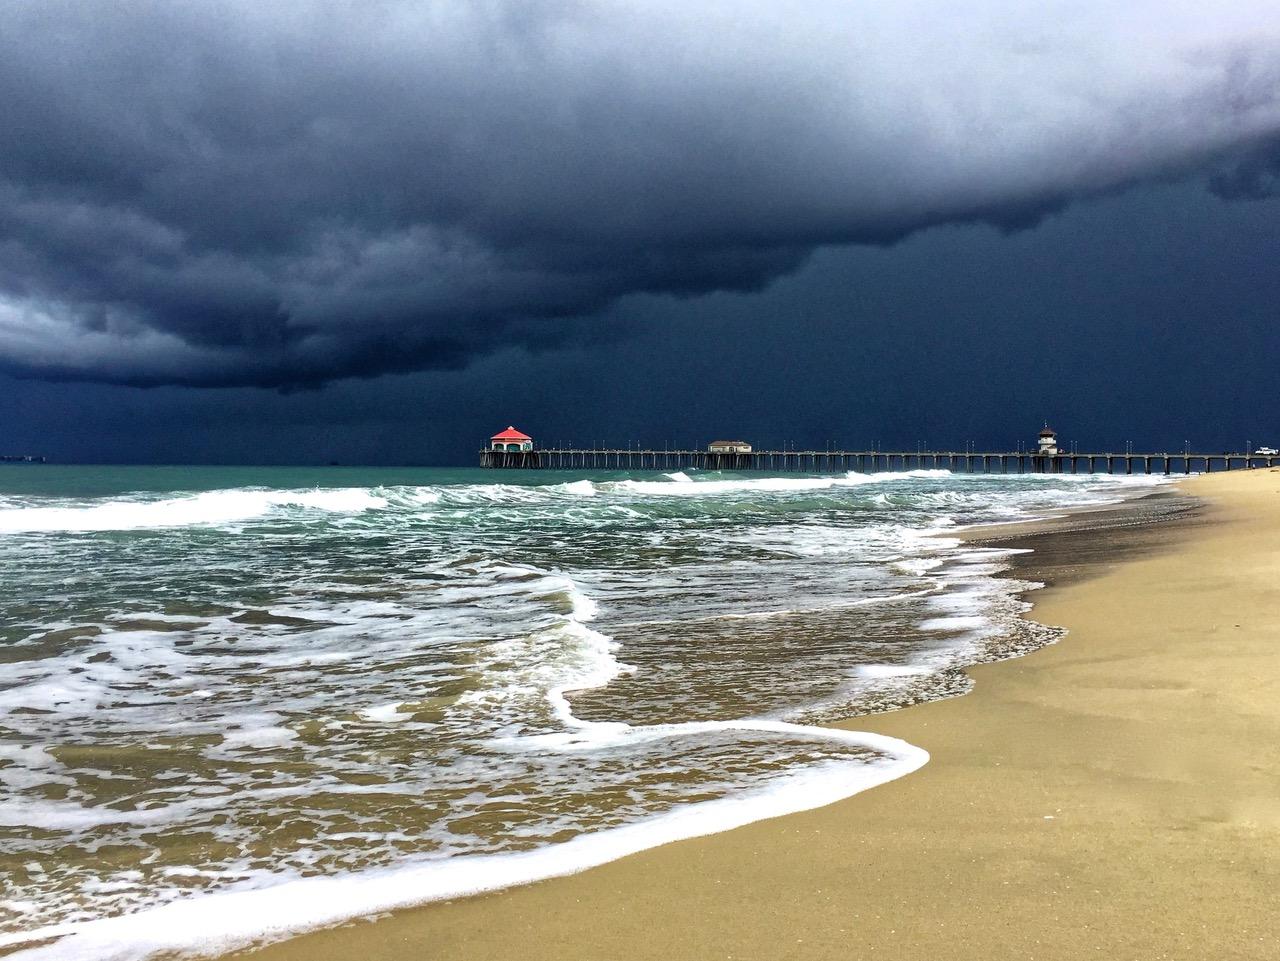 Just minutes before hell broke loose in Huntington Beach, California